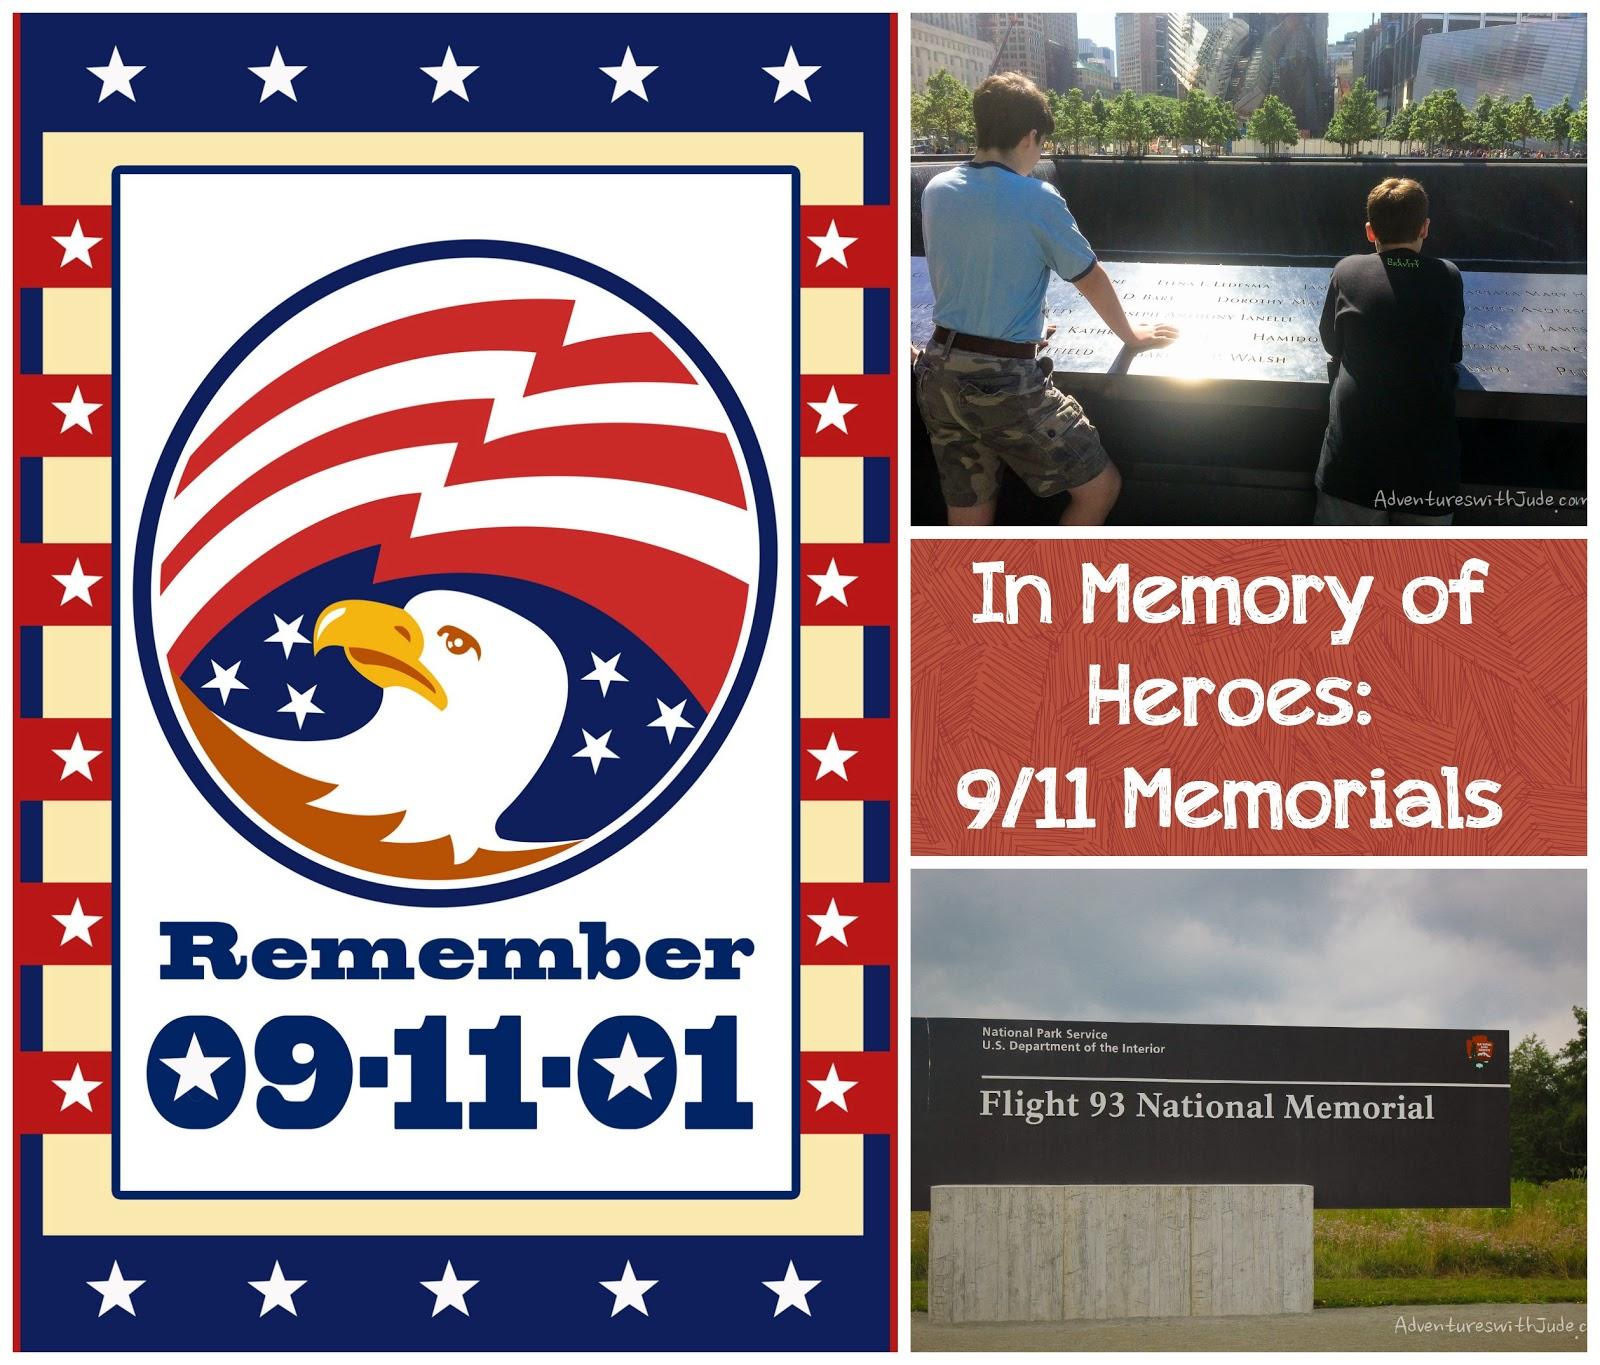 In Memory of Heroes: 9/11 Memorials